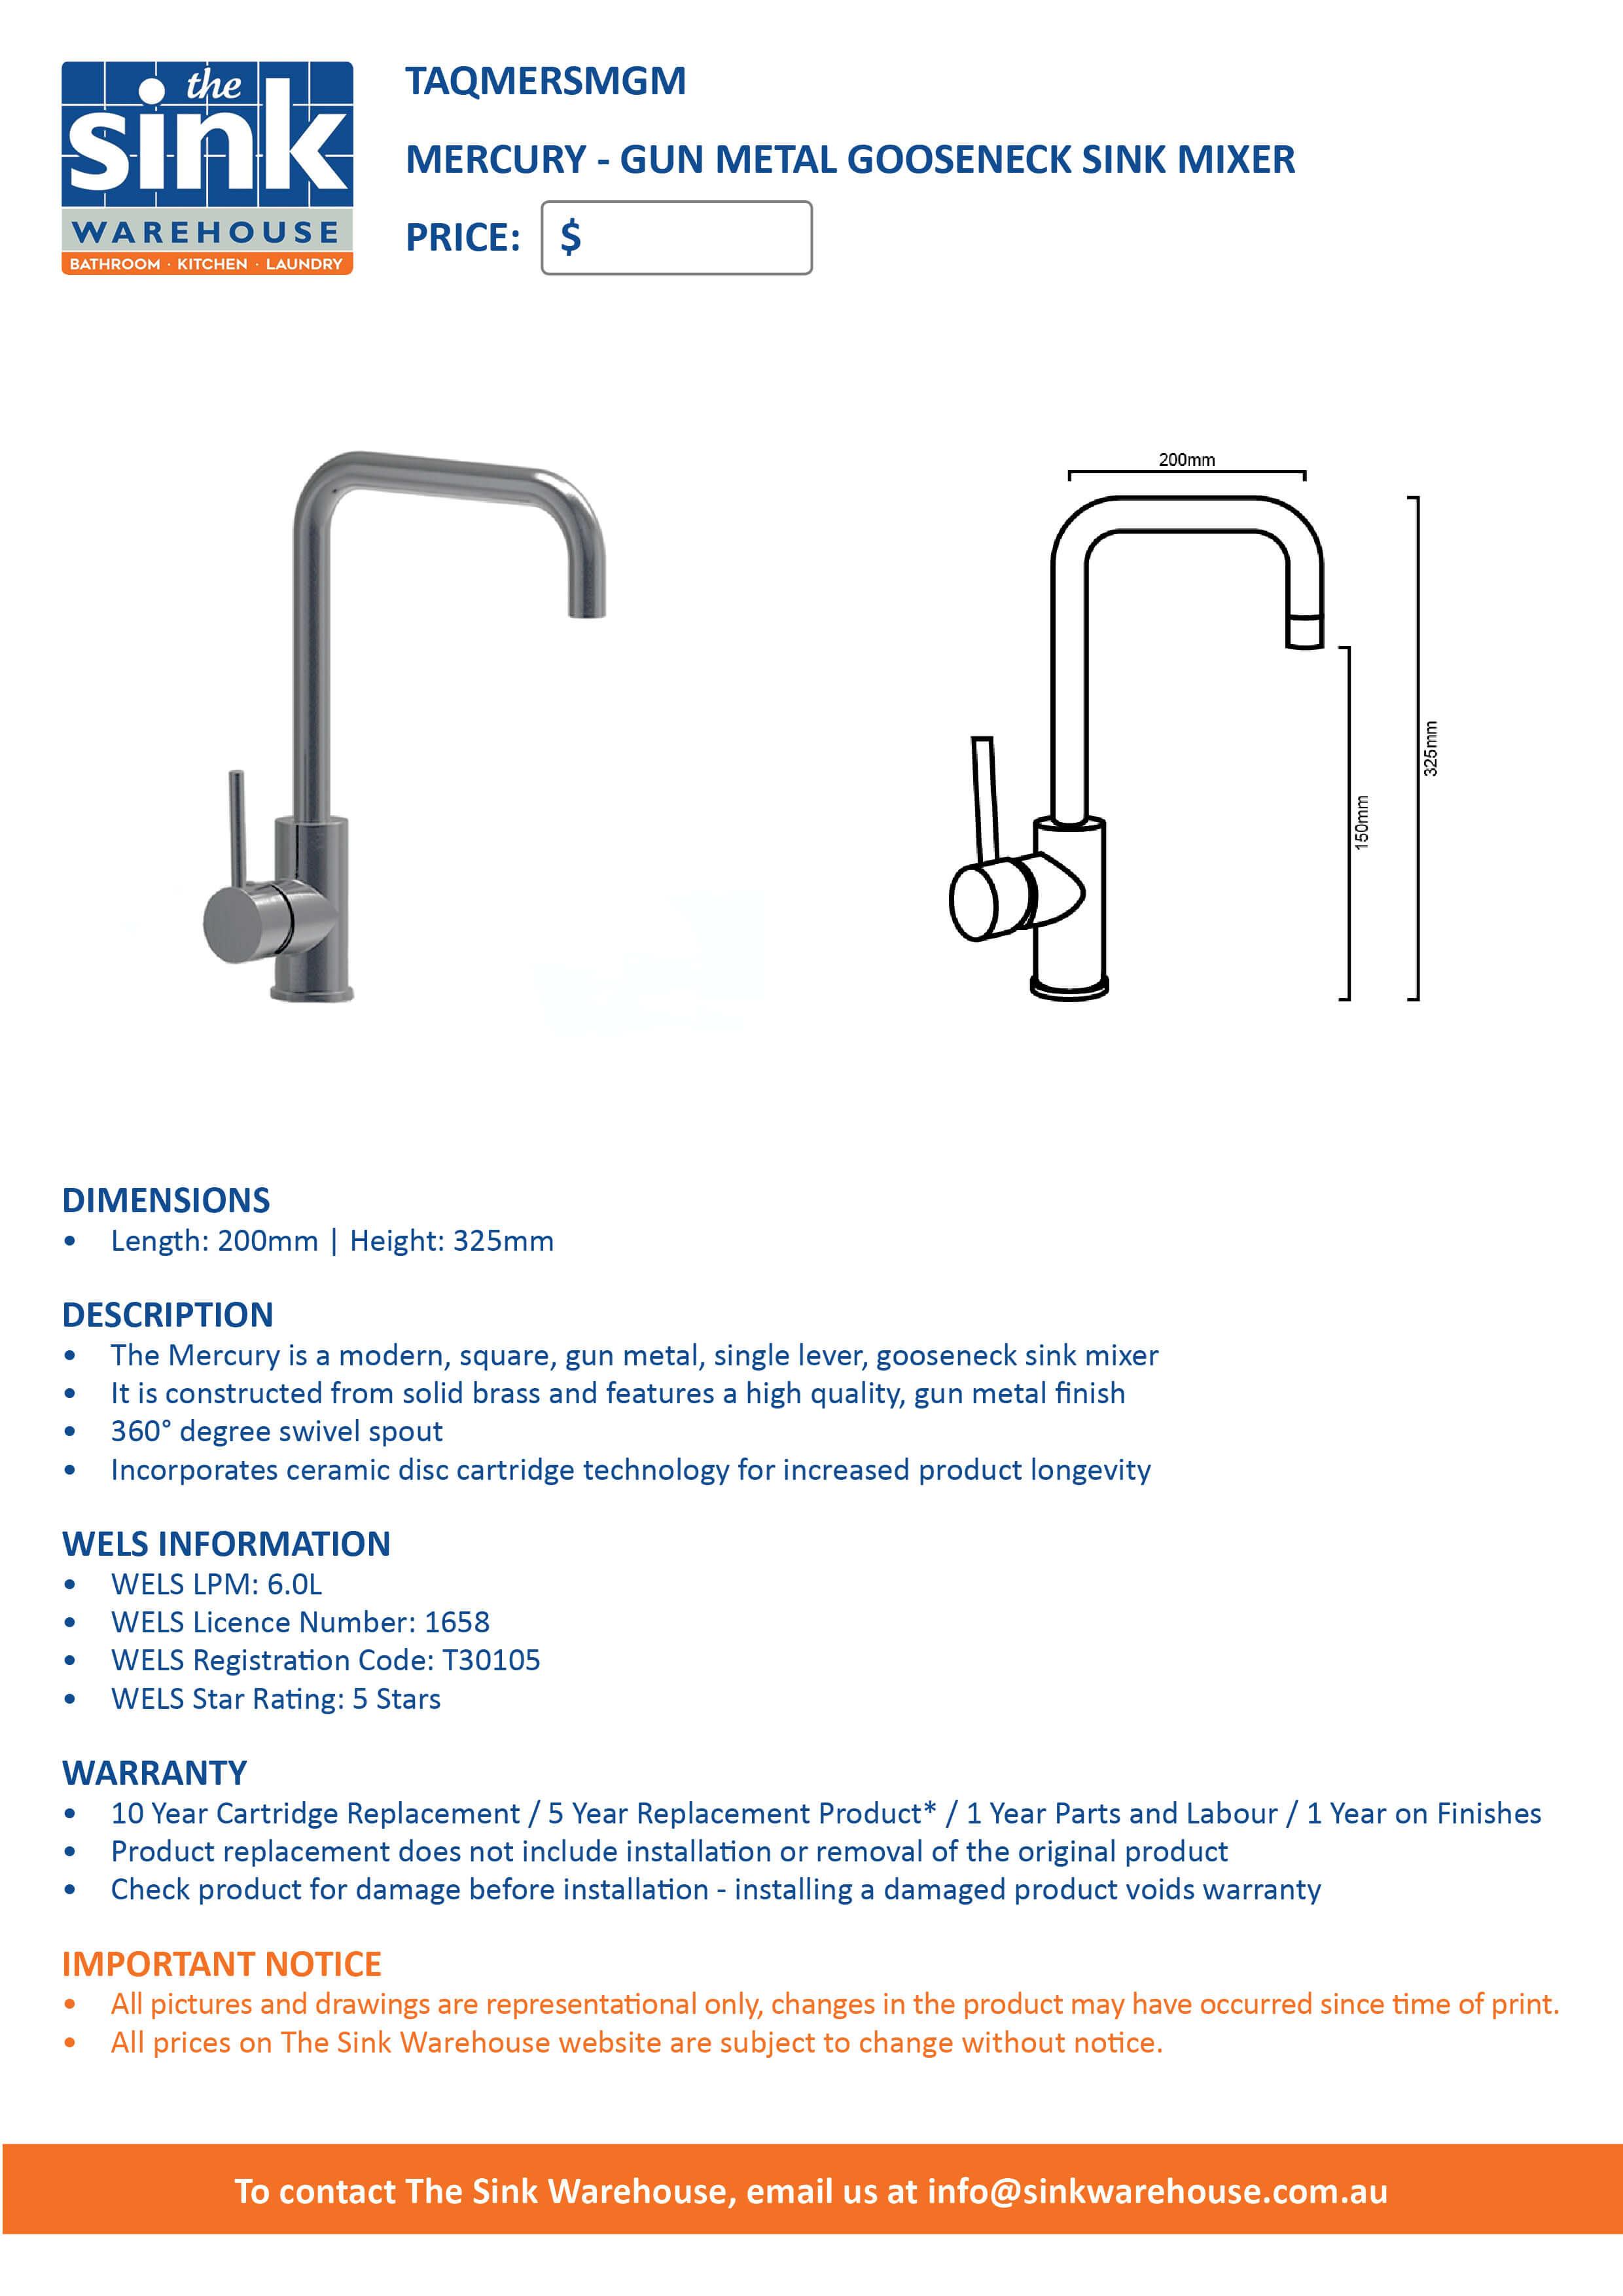 mercury-gun-metal-gooseneck-sink-mixer.jpg